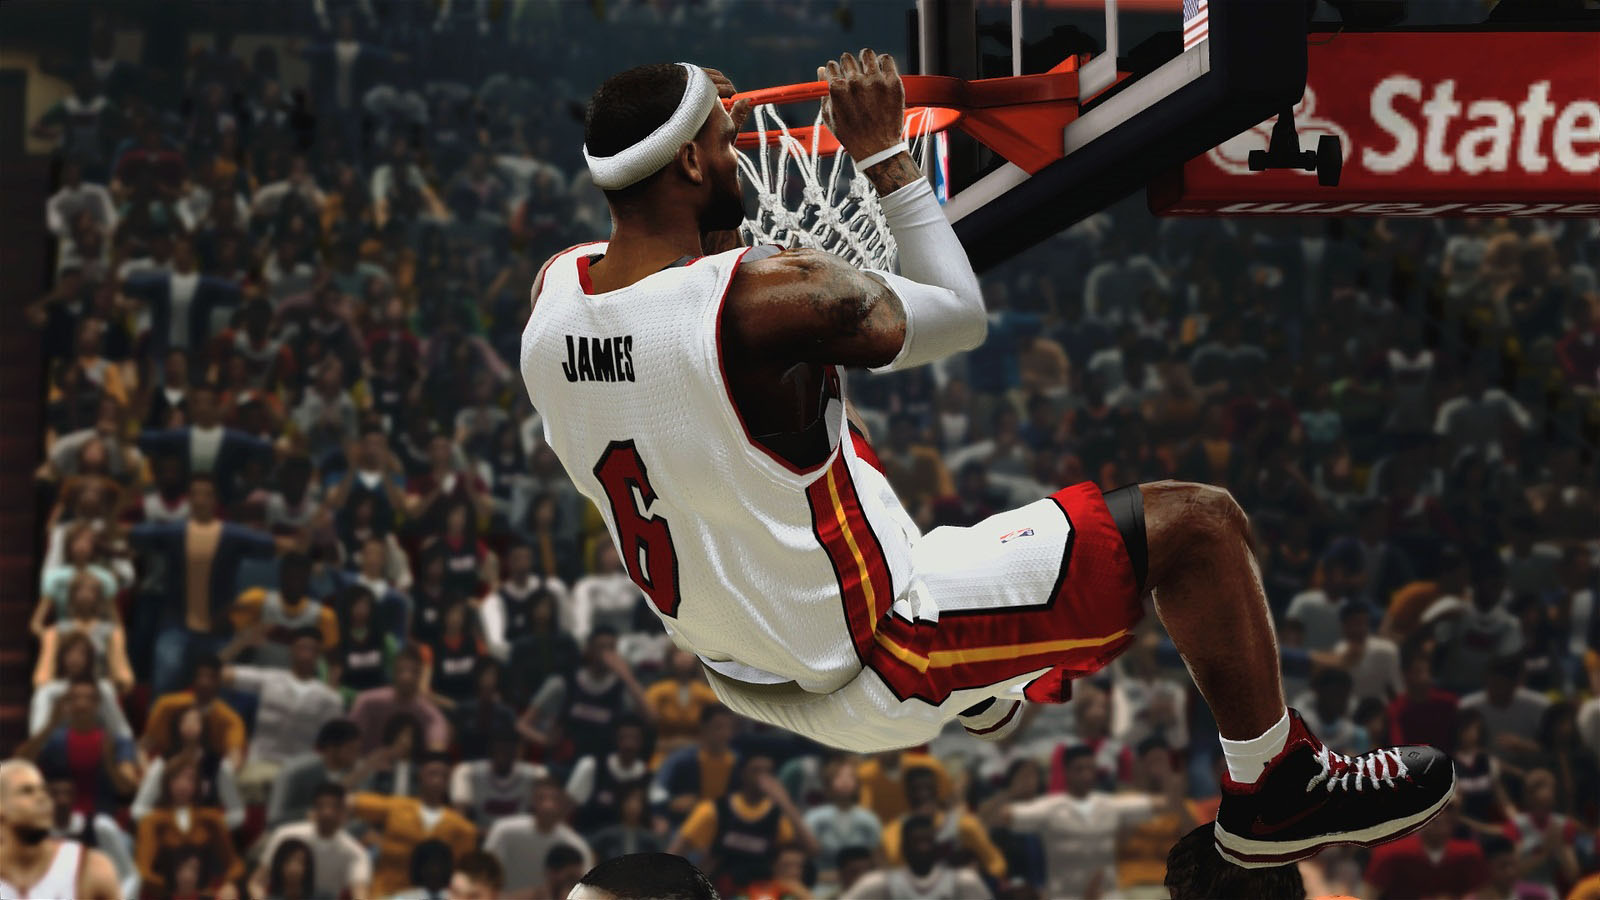 LeBron James dunking NBA 2K14   1600x900   Wallpaper 3607 on 1600x900